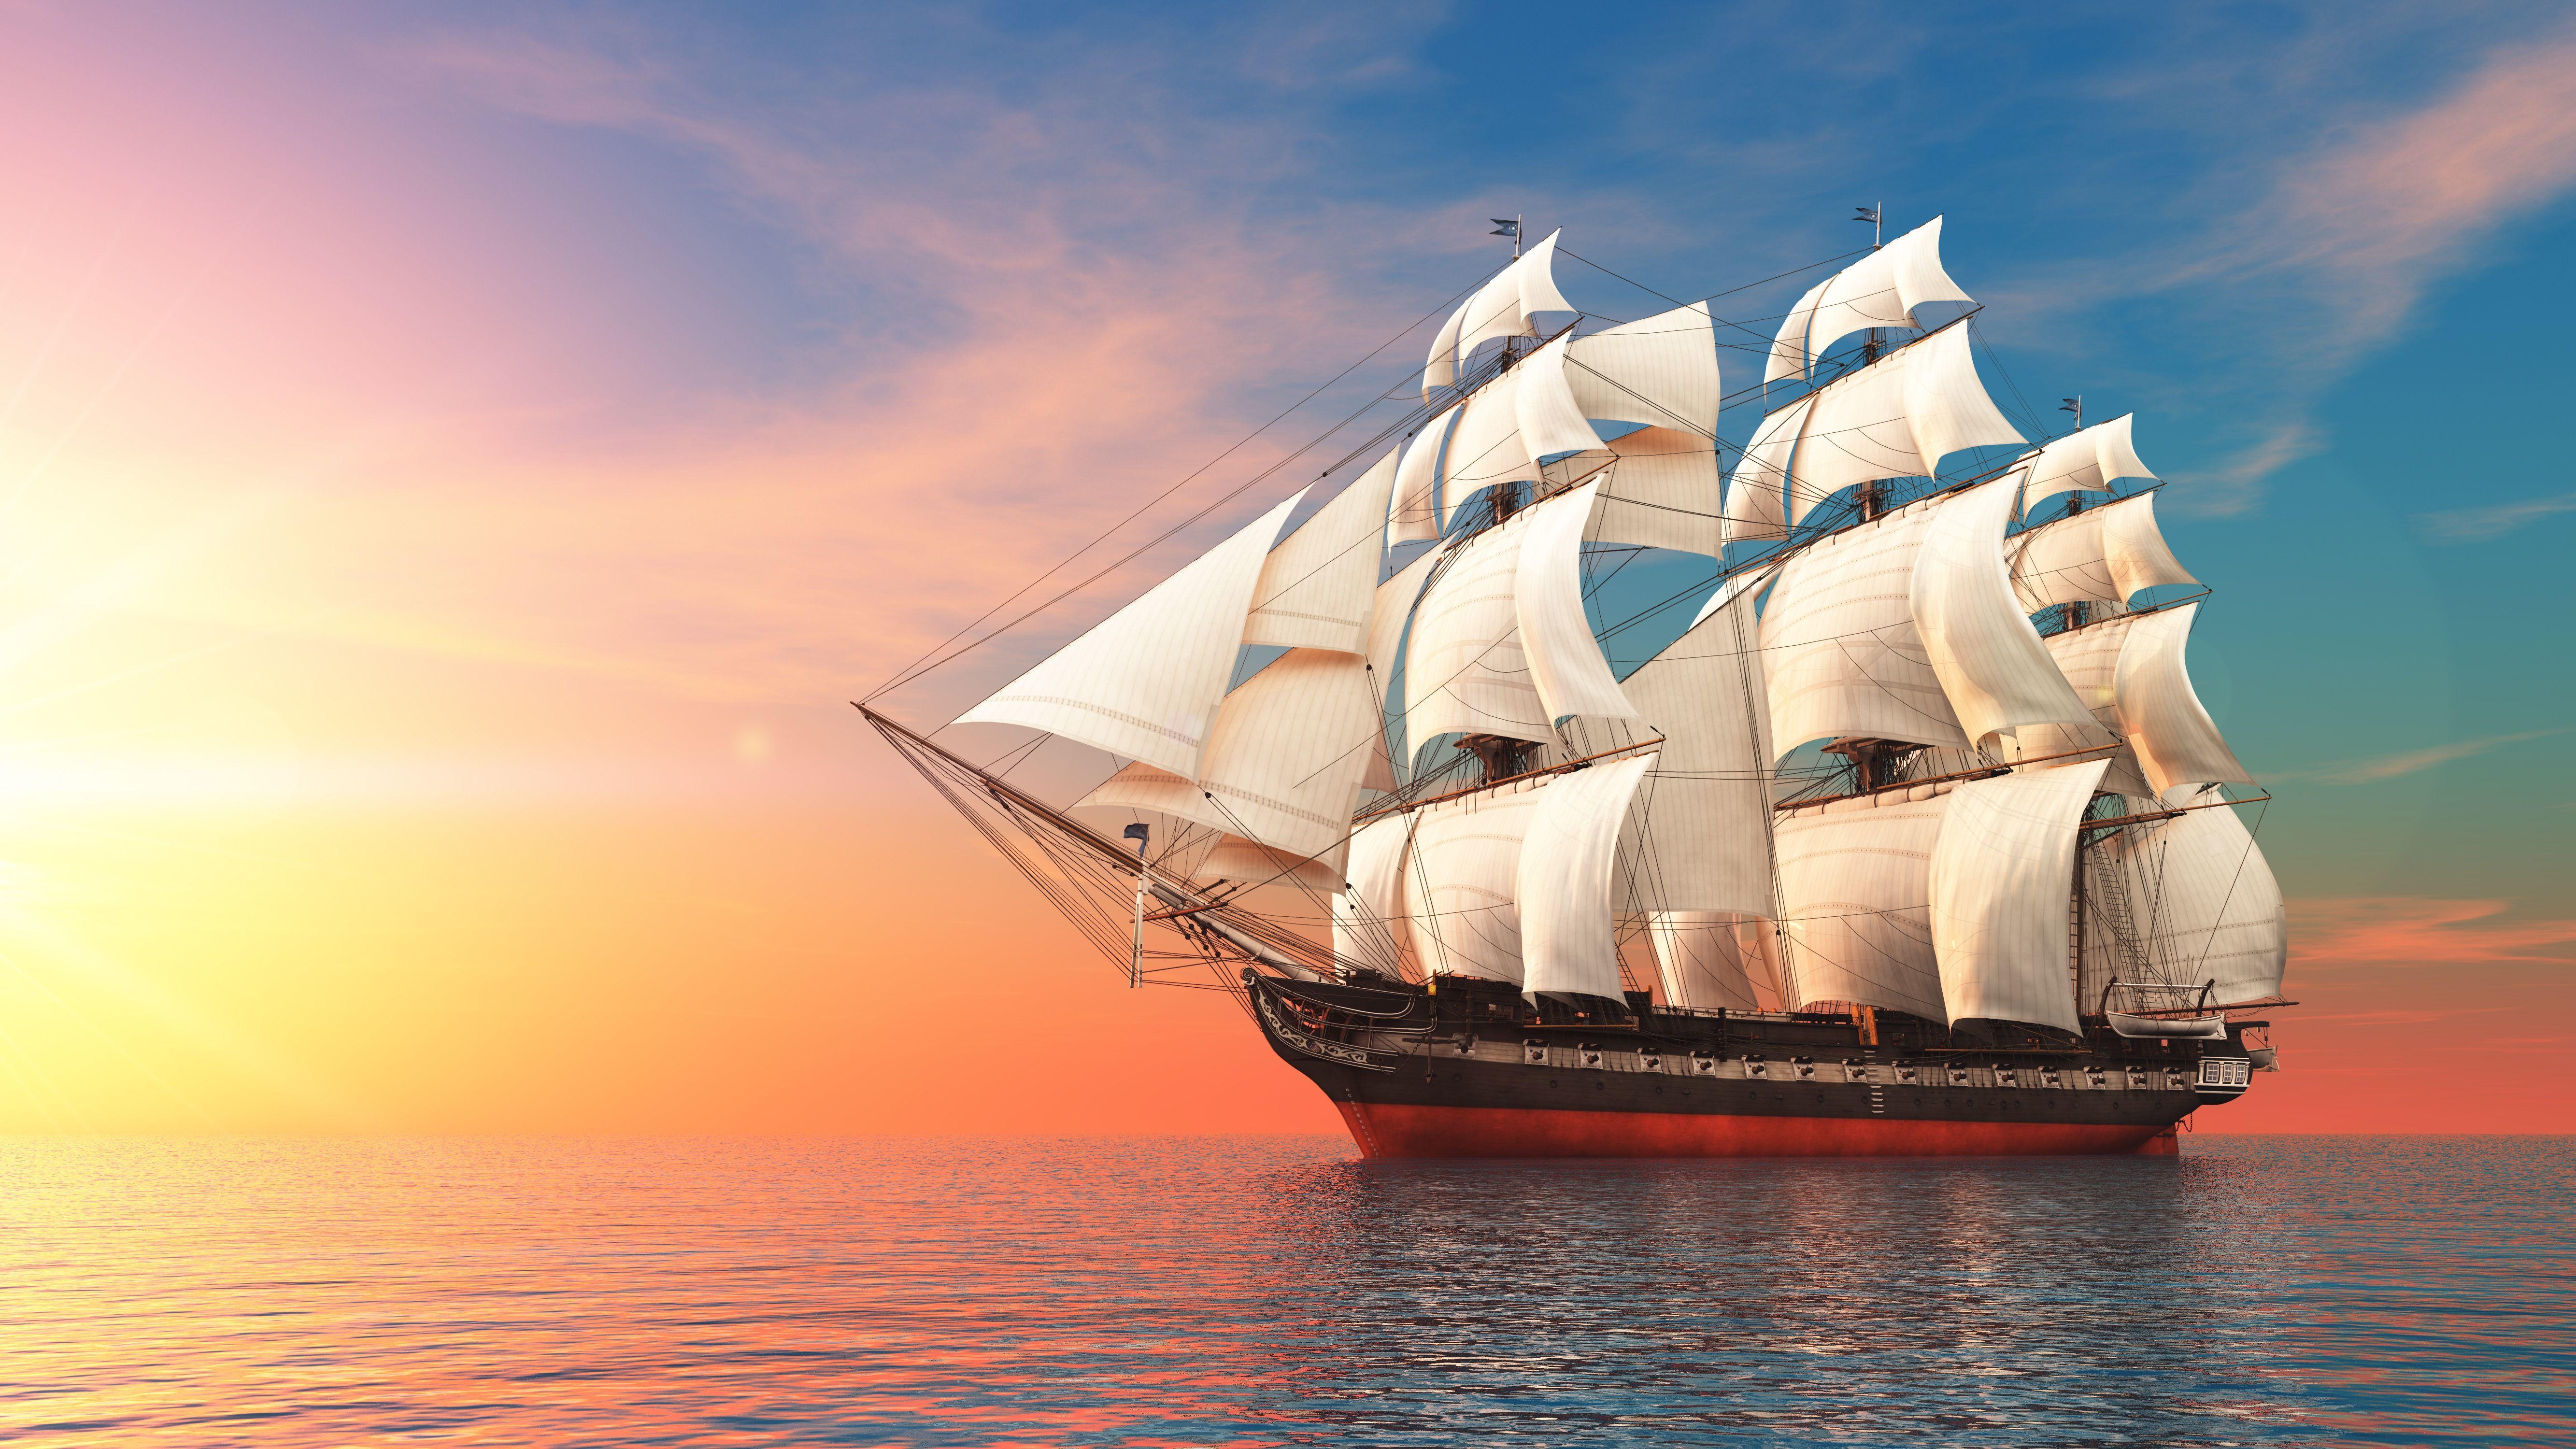 Картинка: Корабль, паруса, океан, вода, небо, солнце